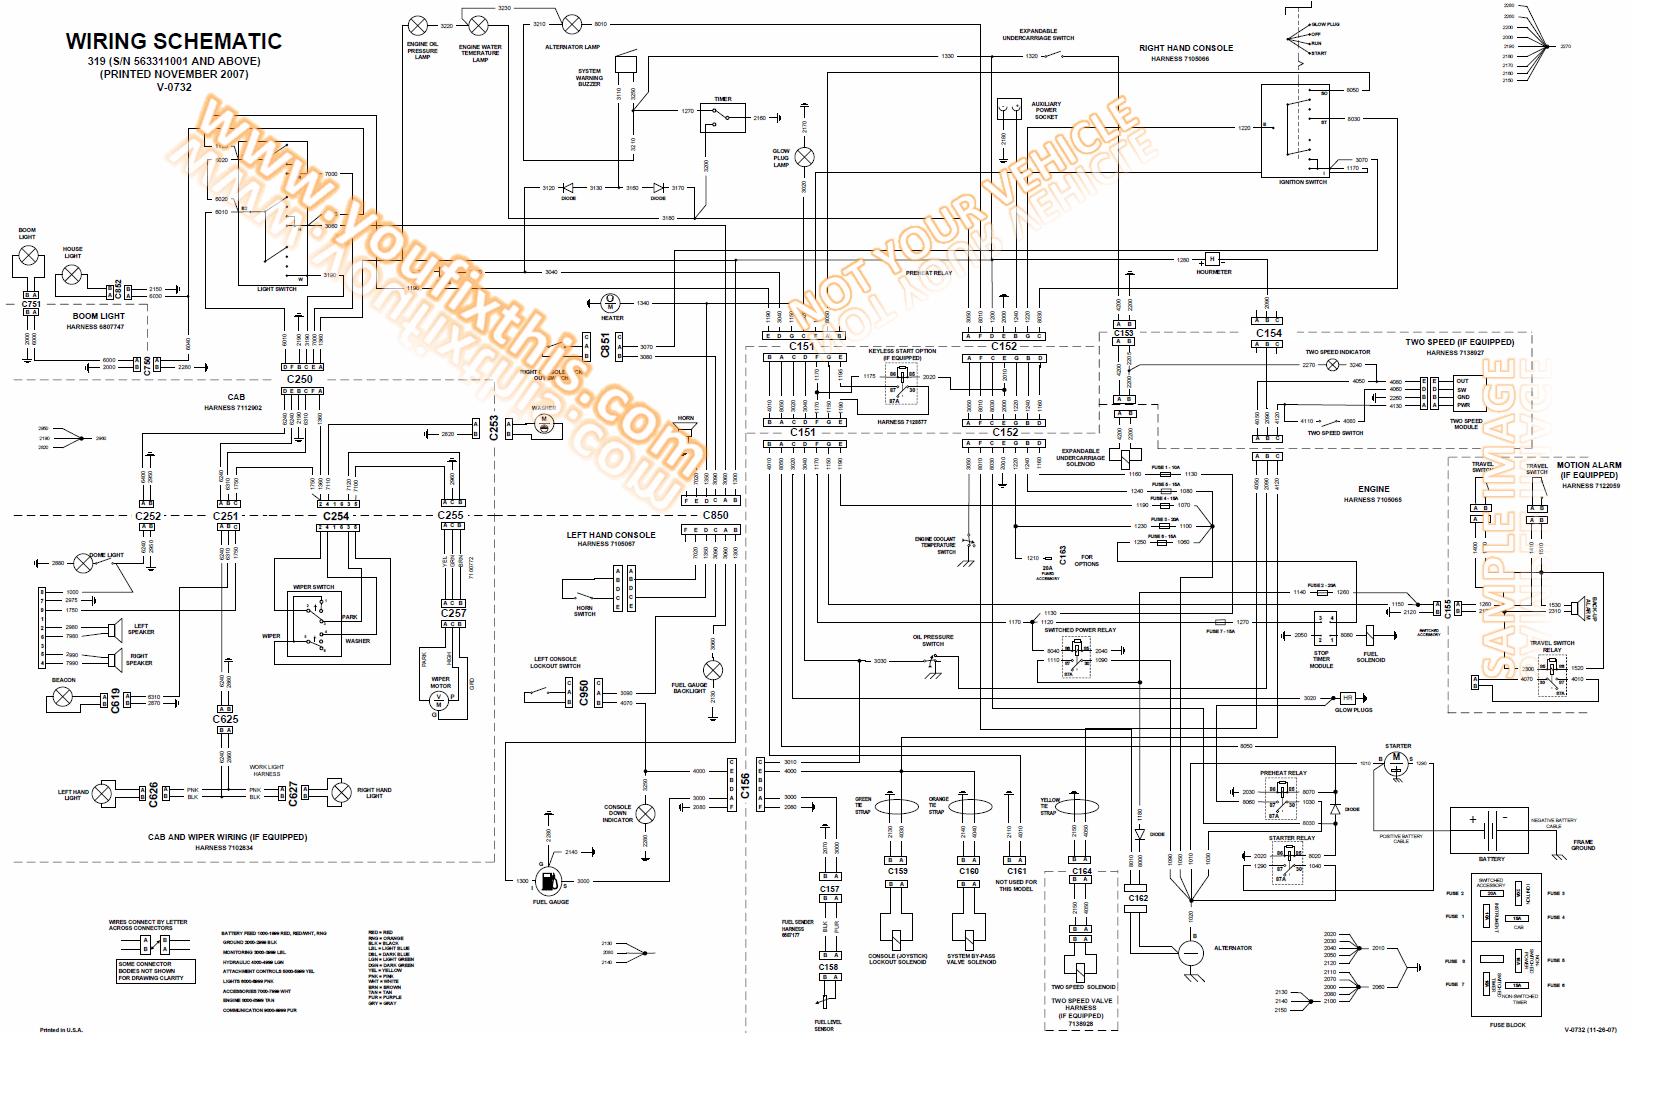 Sensational Bobcat 864 Schematic Basic Electronics Wiring Diagram Wiring 101 Akebretraxxcnl